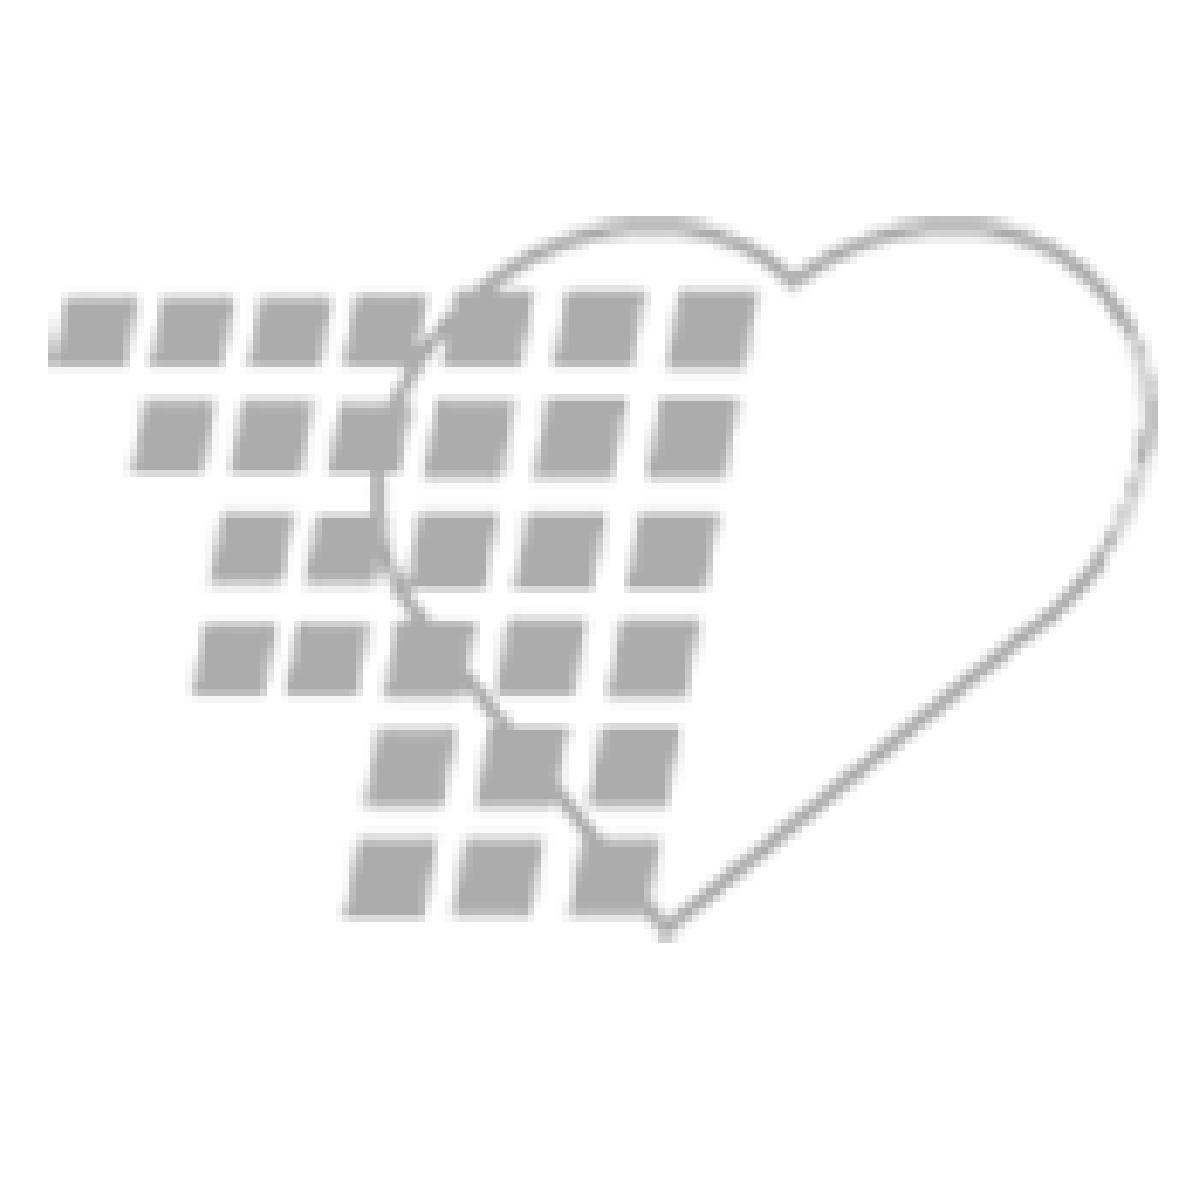 12-87-3911 - Dover   Pediatric Urine Specimen Collector - 100 mL